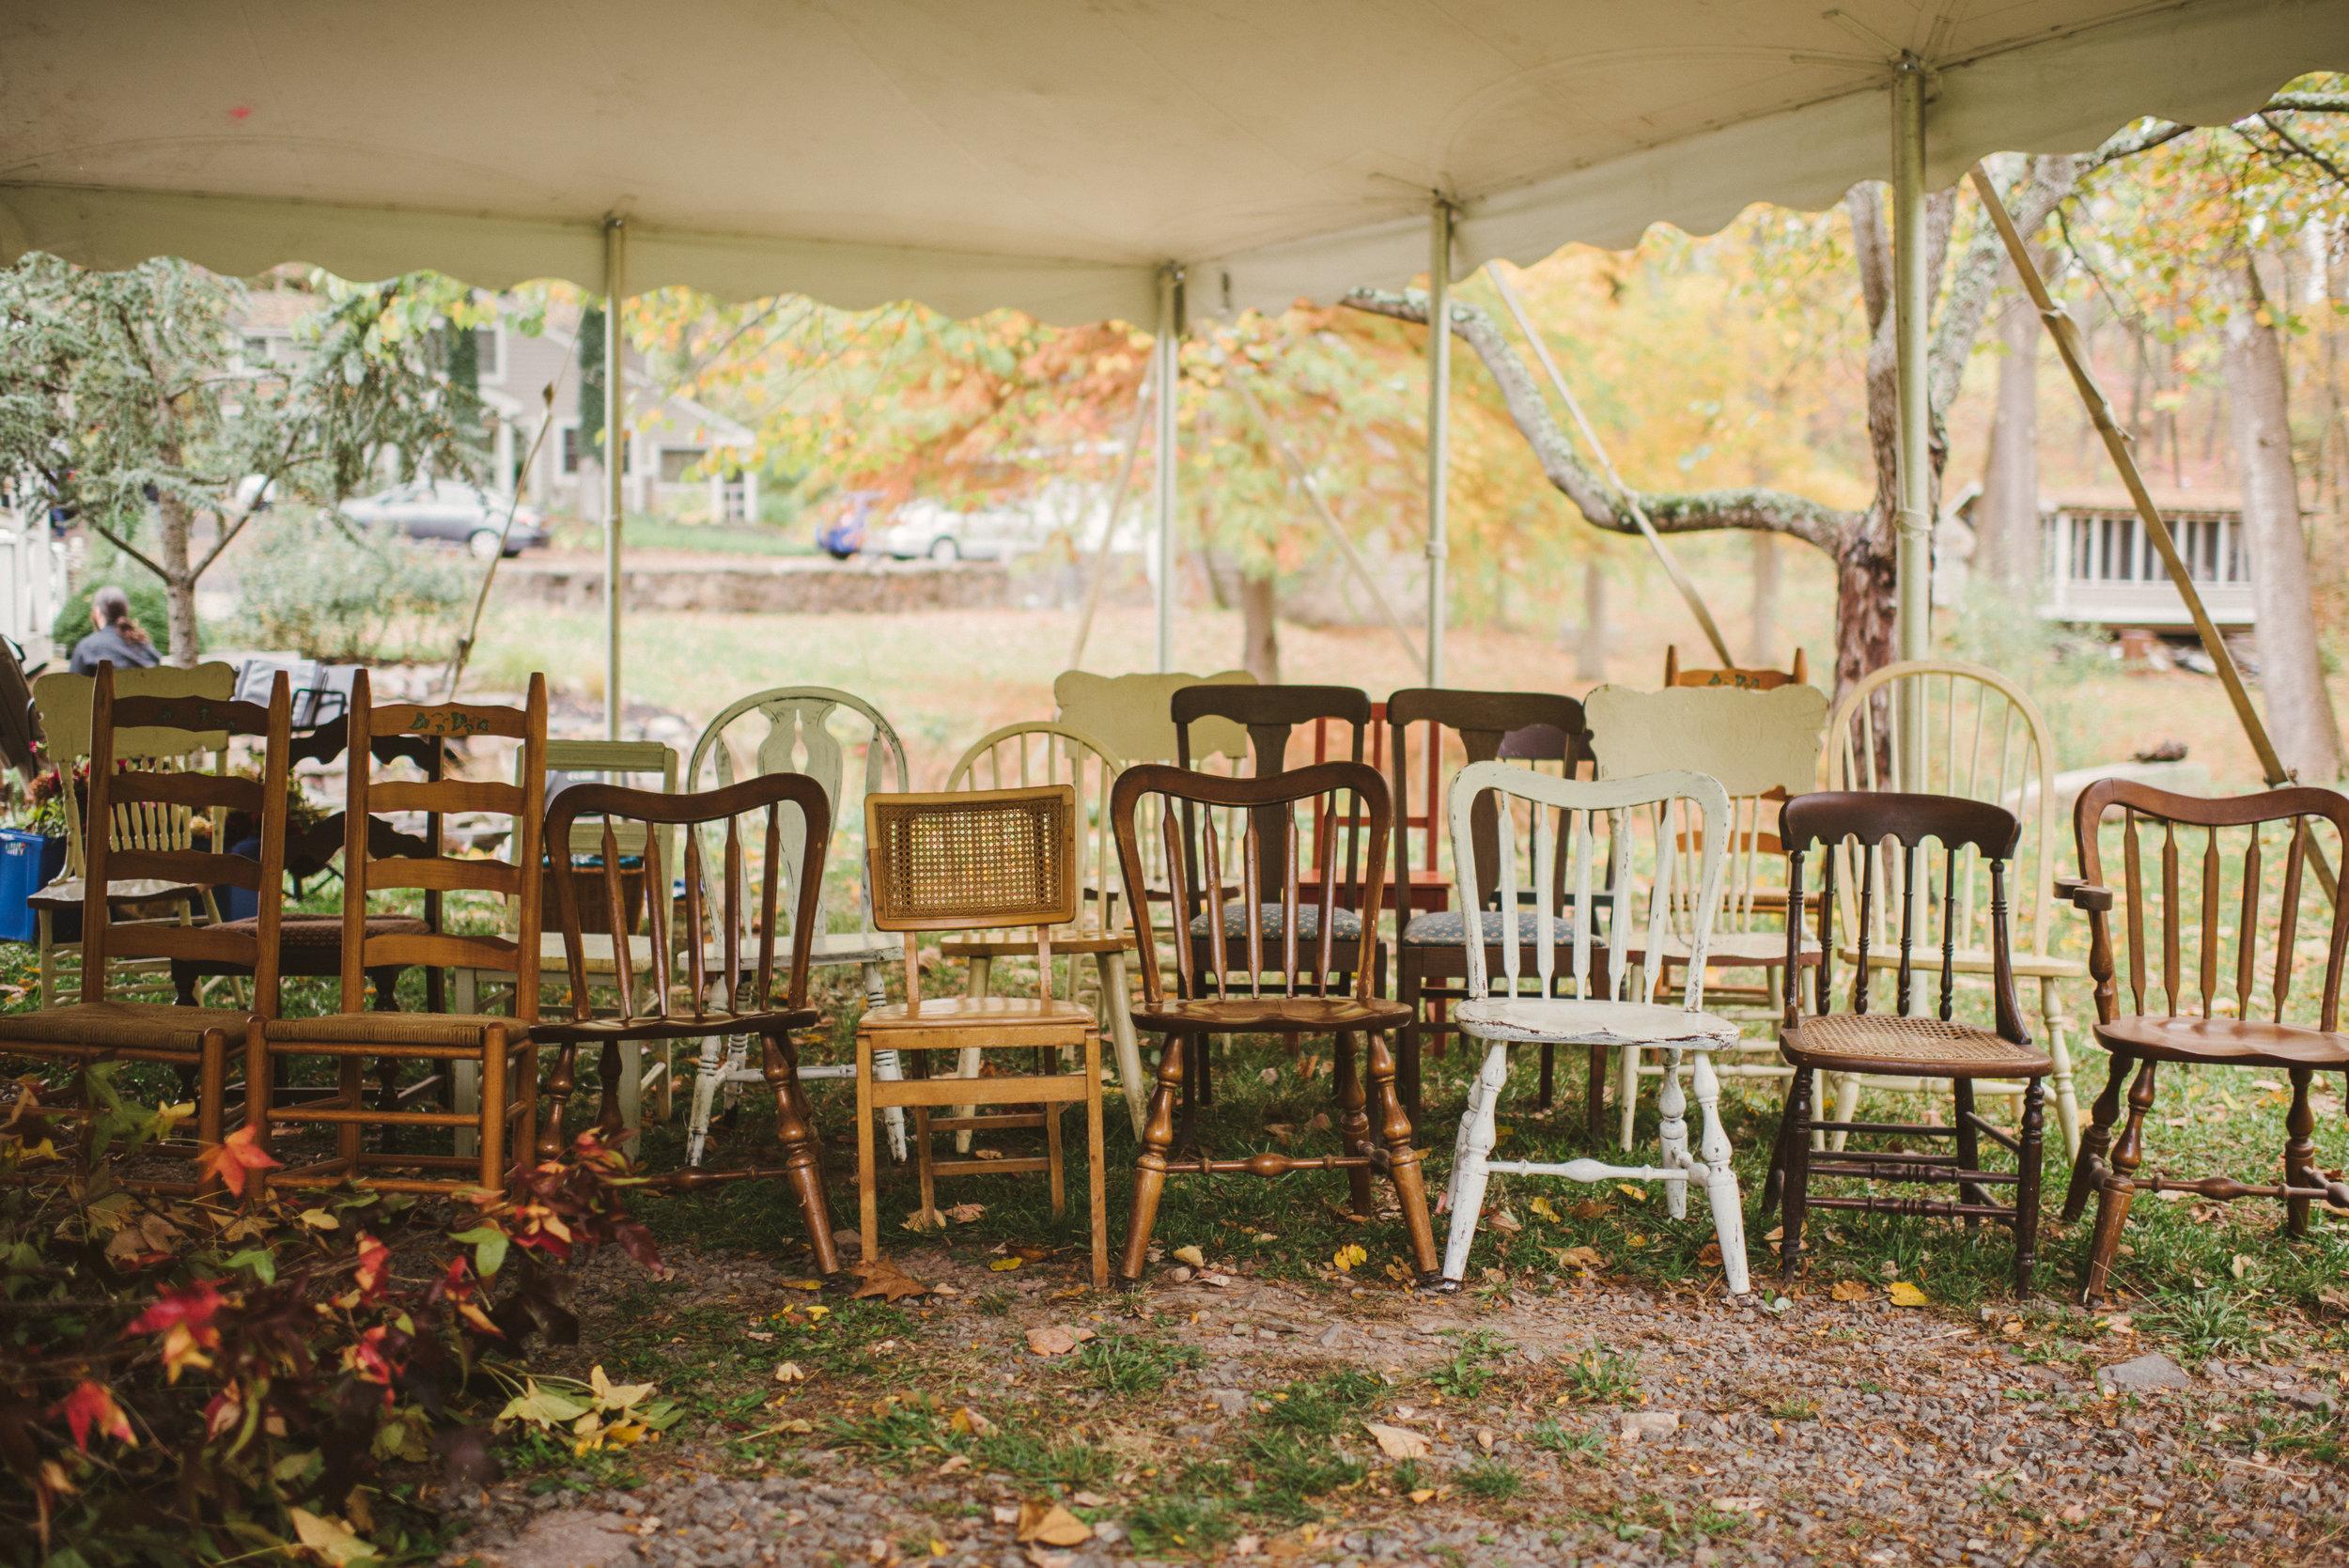 JACQUELINE & ANDREW WARSHAWER -BROOKMILL FARM FALL WEDDING - INTIMATE WEDDING PHOTOGRAPHER - TWOTWENTY by CHI-CHI AGBIM-152.jpg